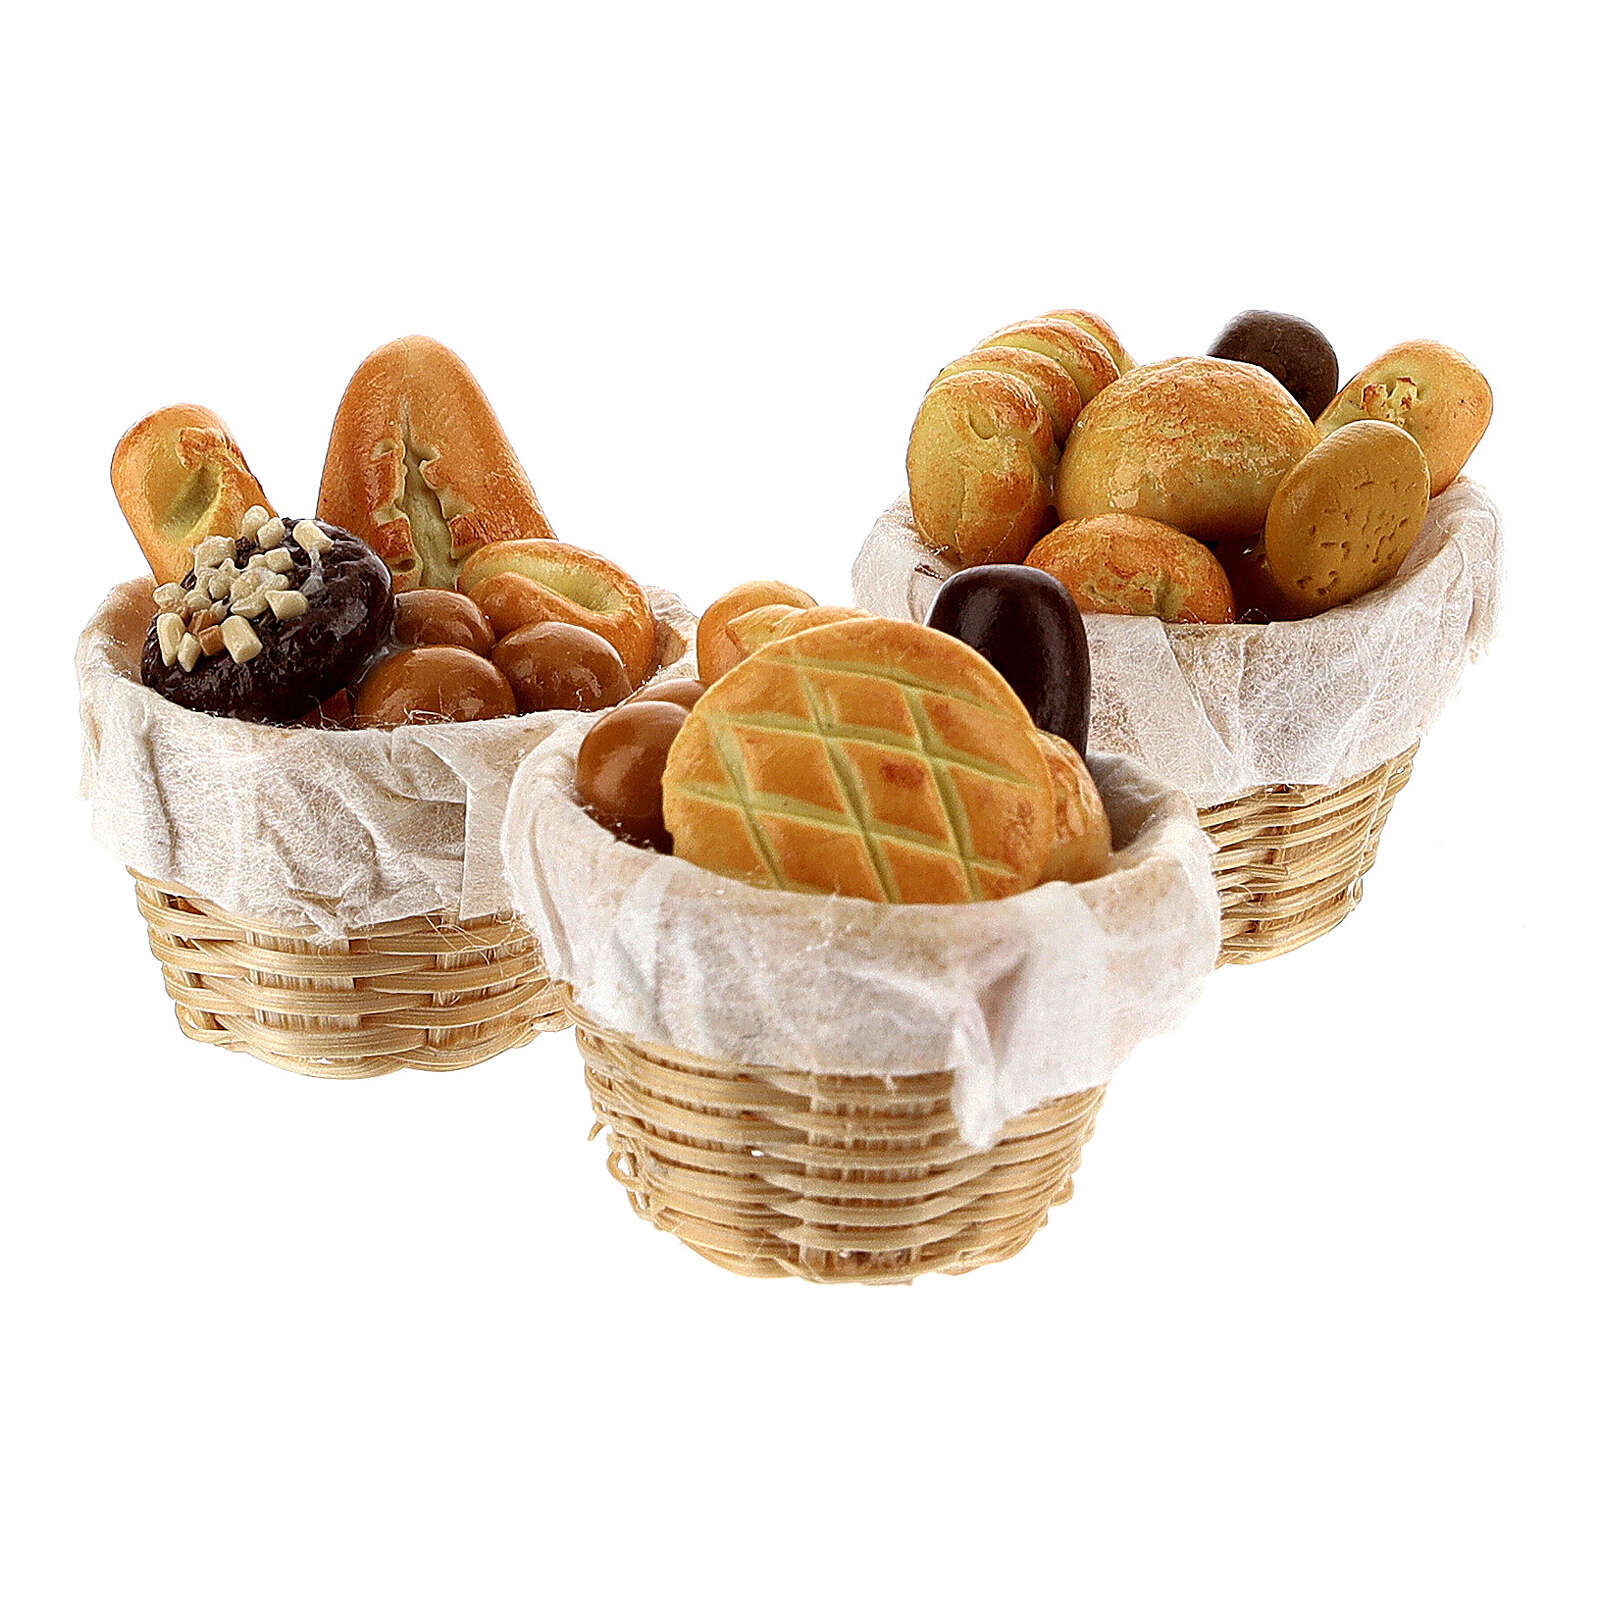 Set 6 baskets with bread Nativity scene 8-10 cm 4